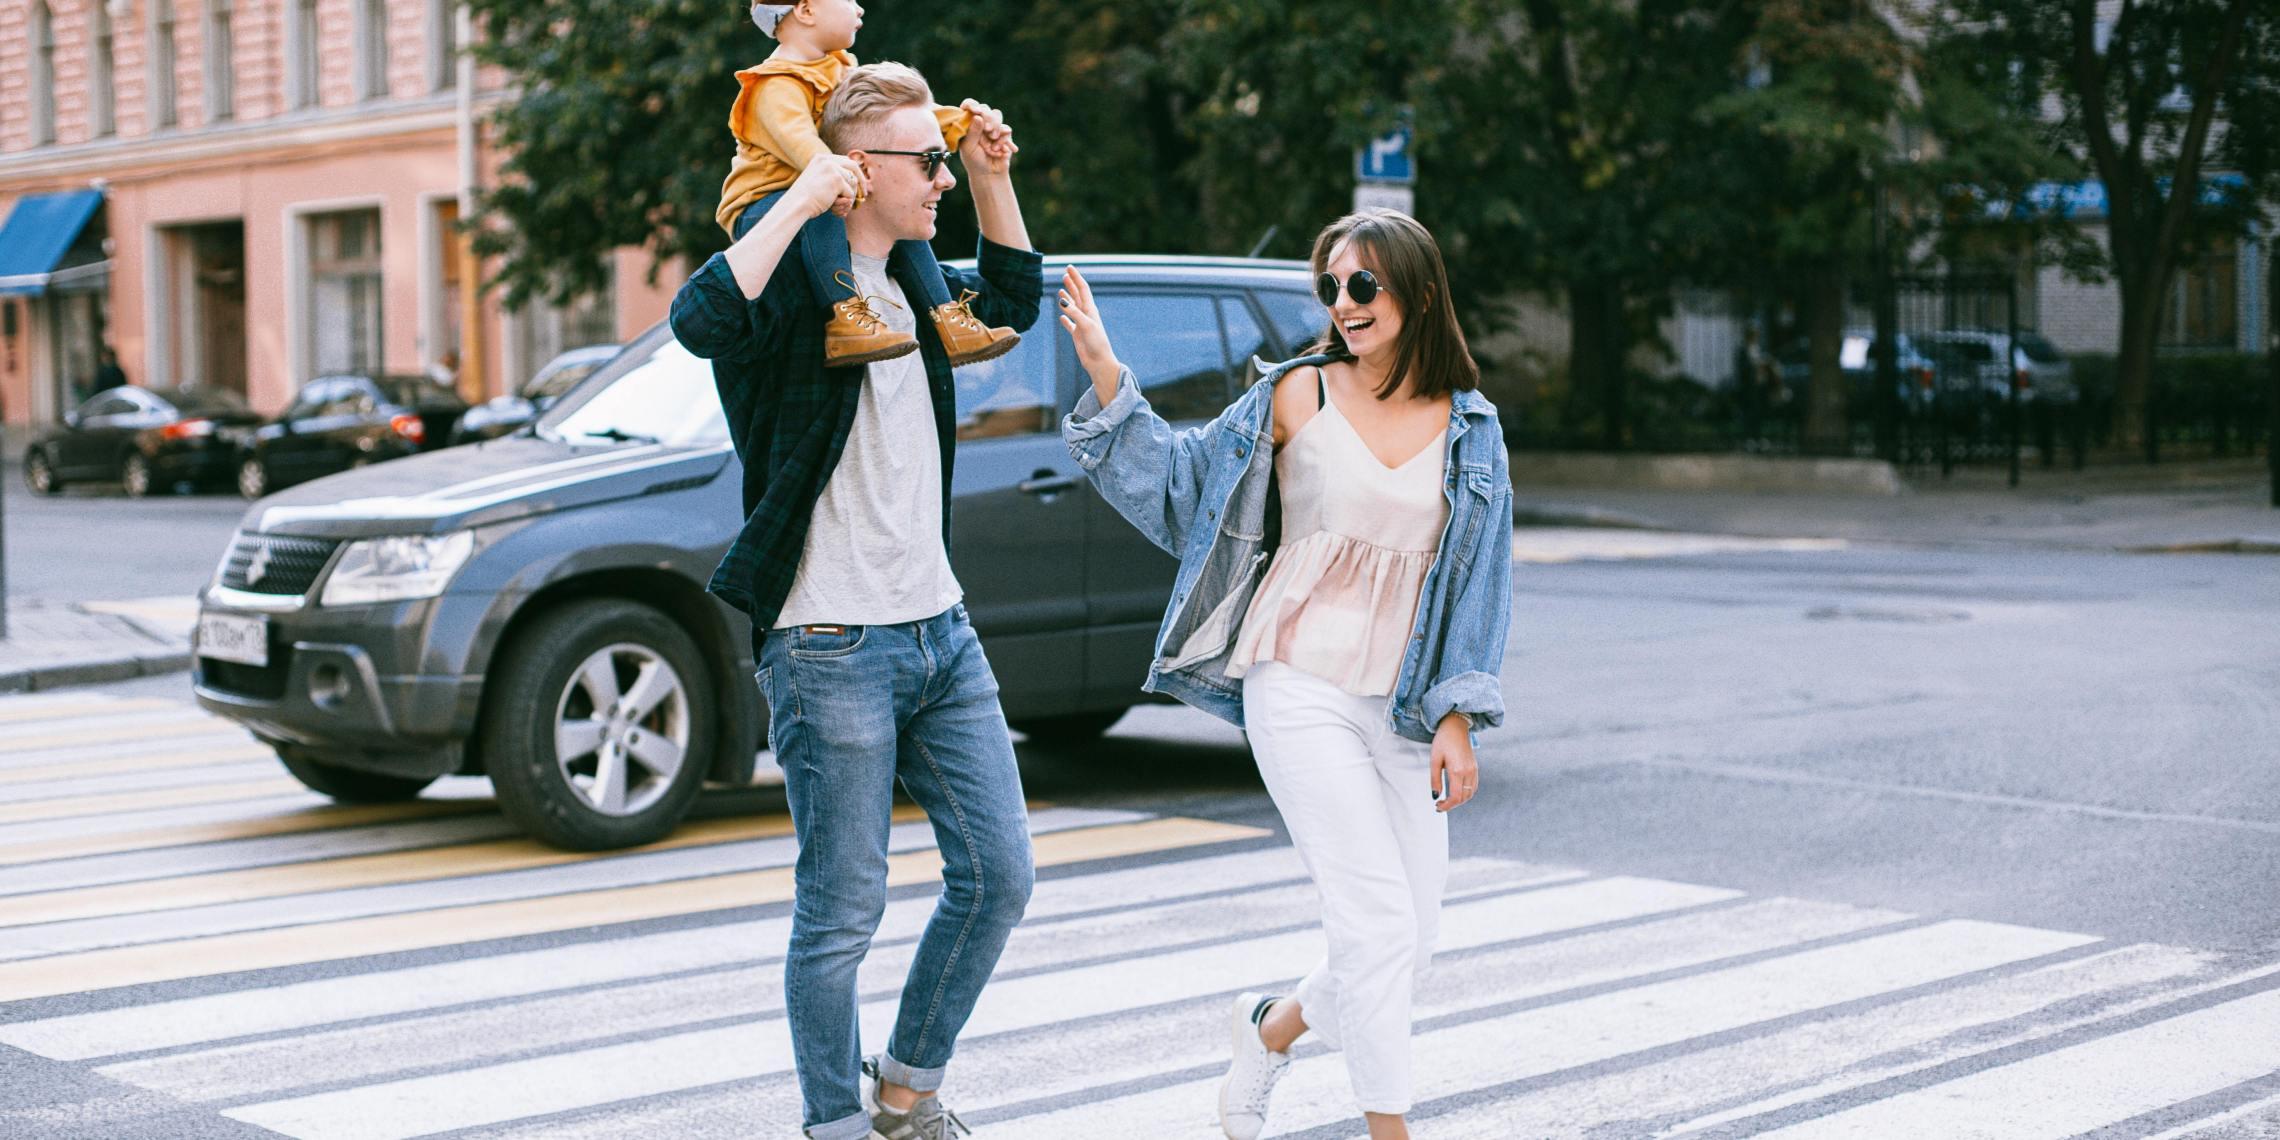 family walking interesting street